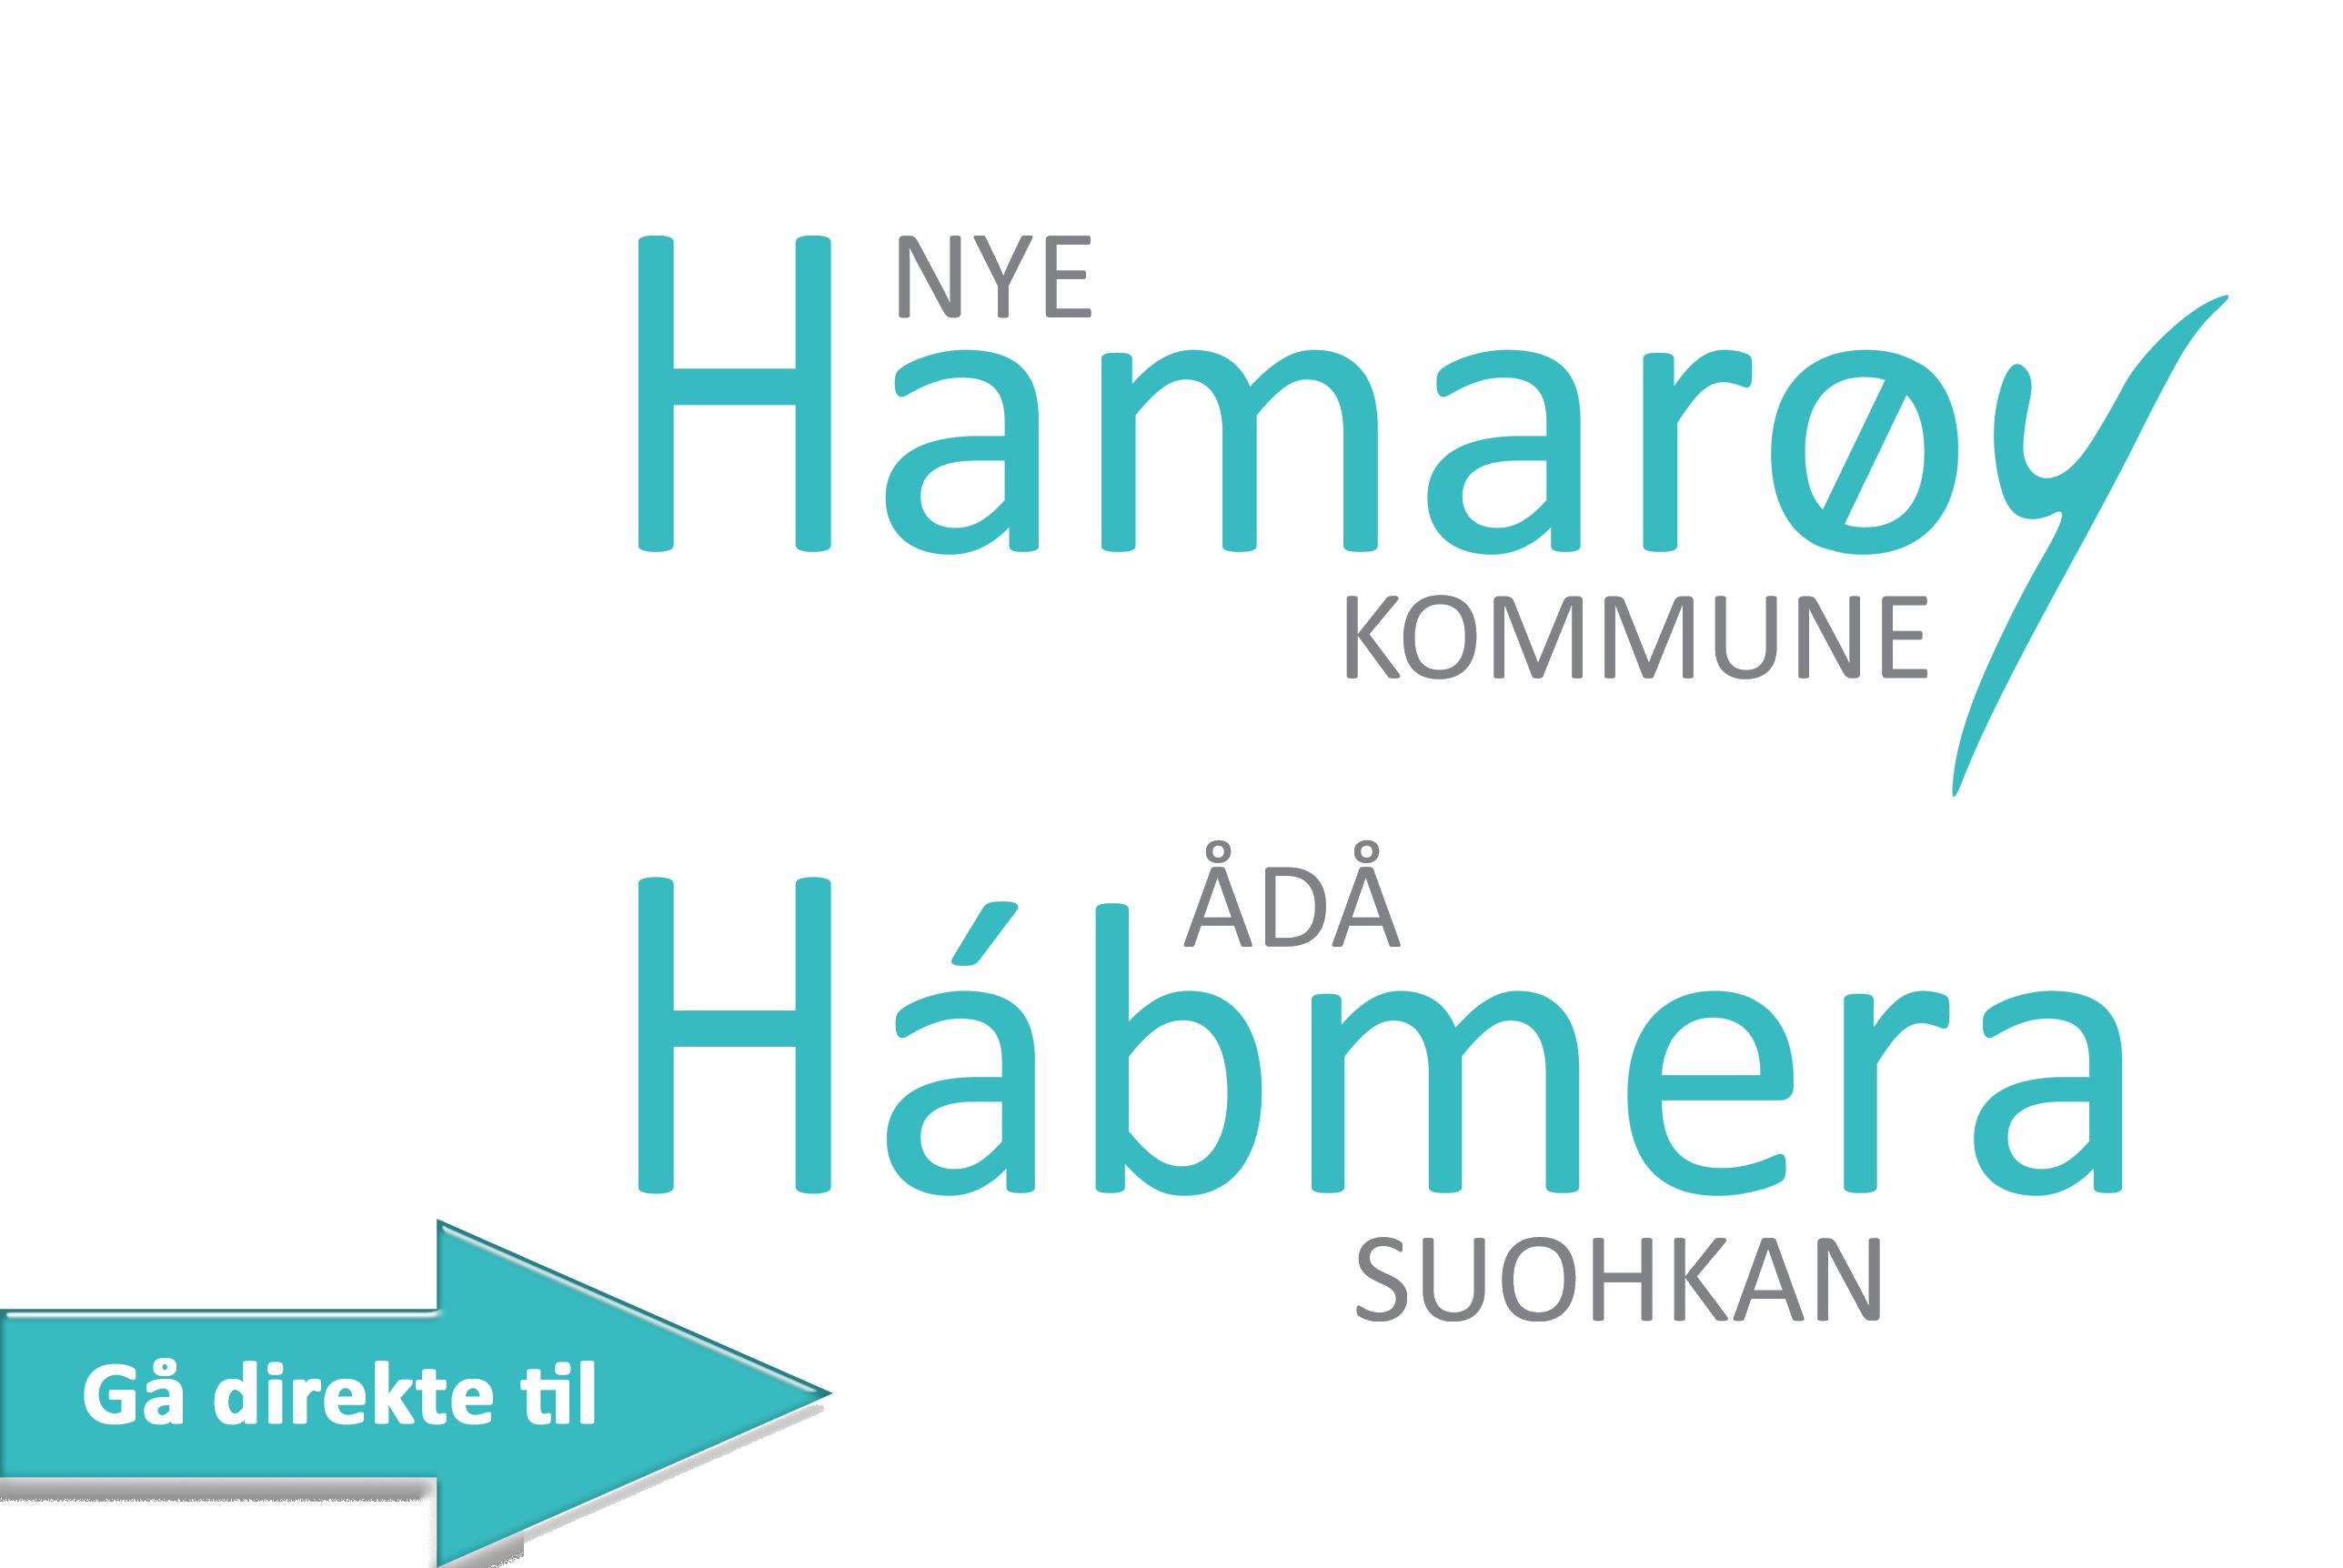 Hamarøy kommune sitt kommunevåpen